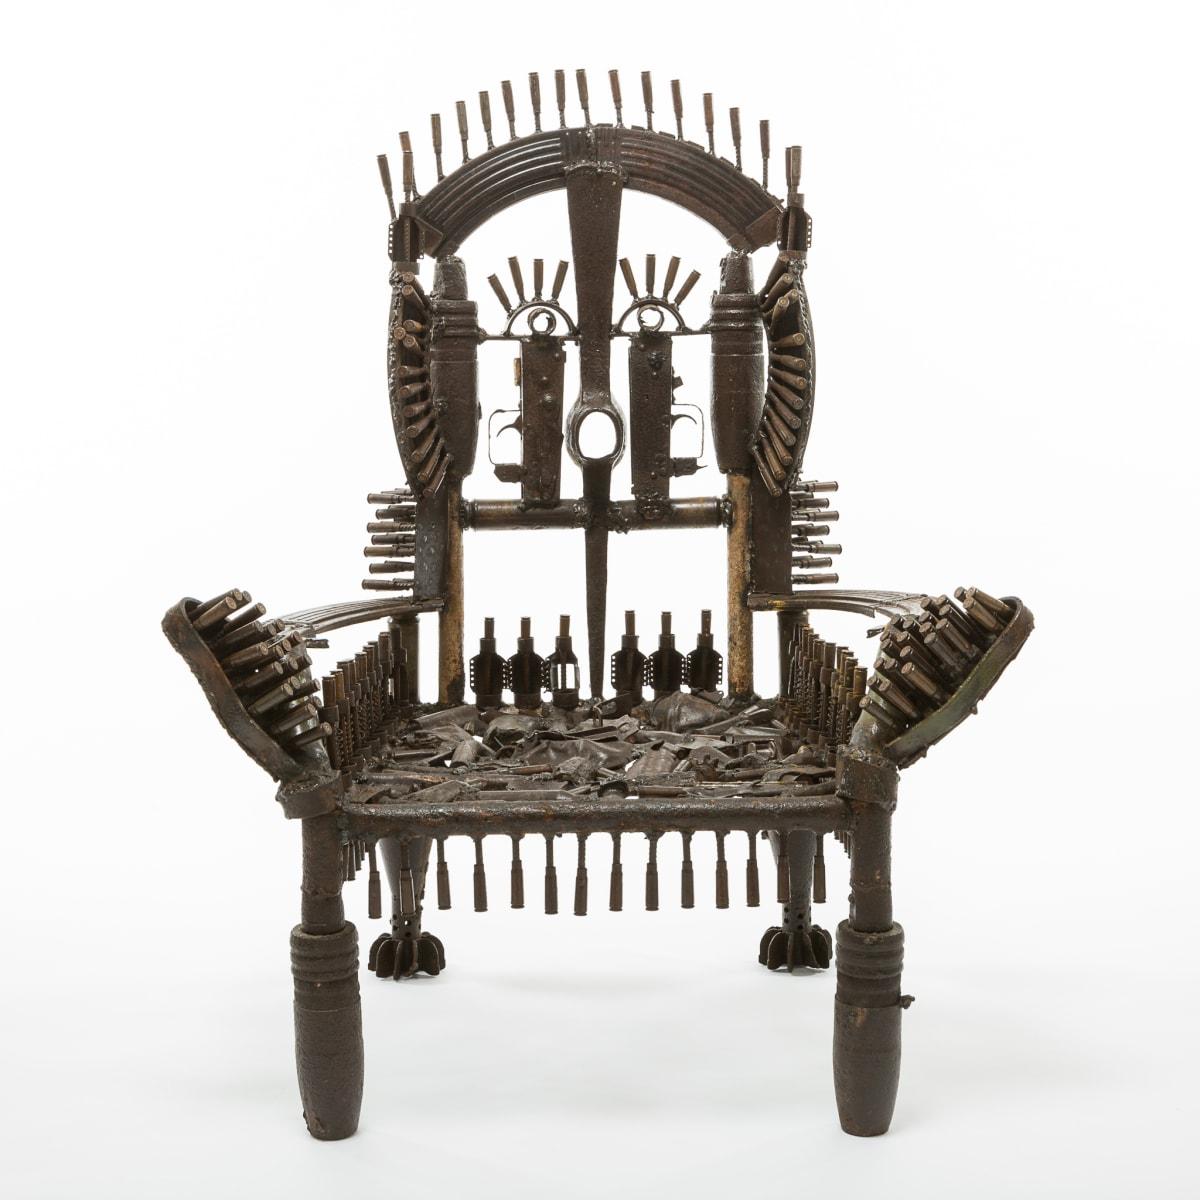 Goncalo Mabunda, The Throne of the Shining Dream, 2016